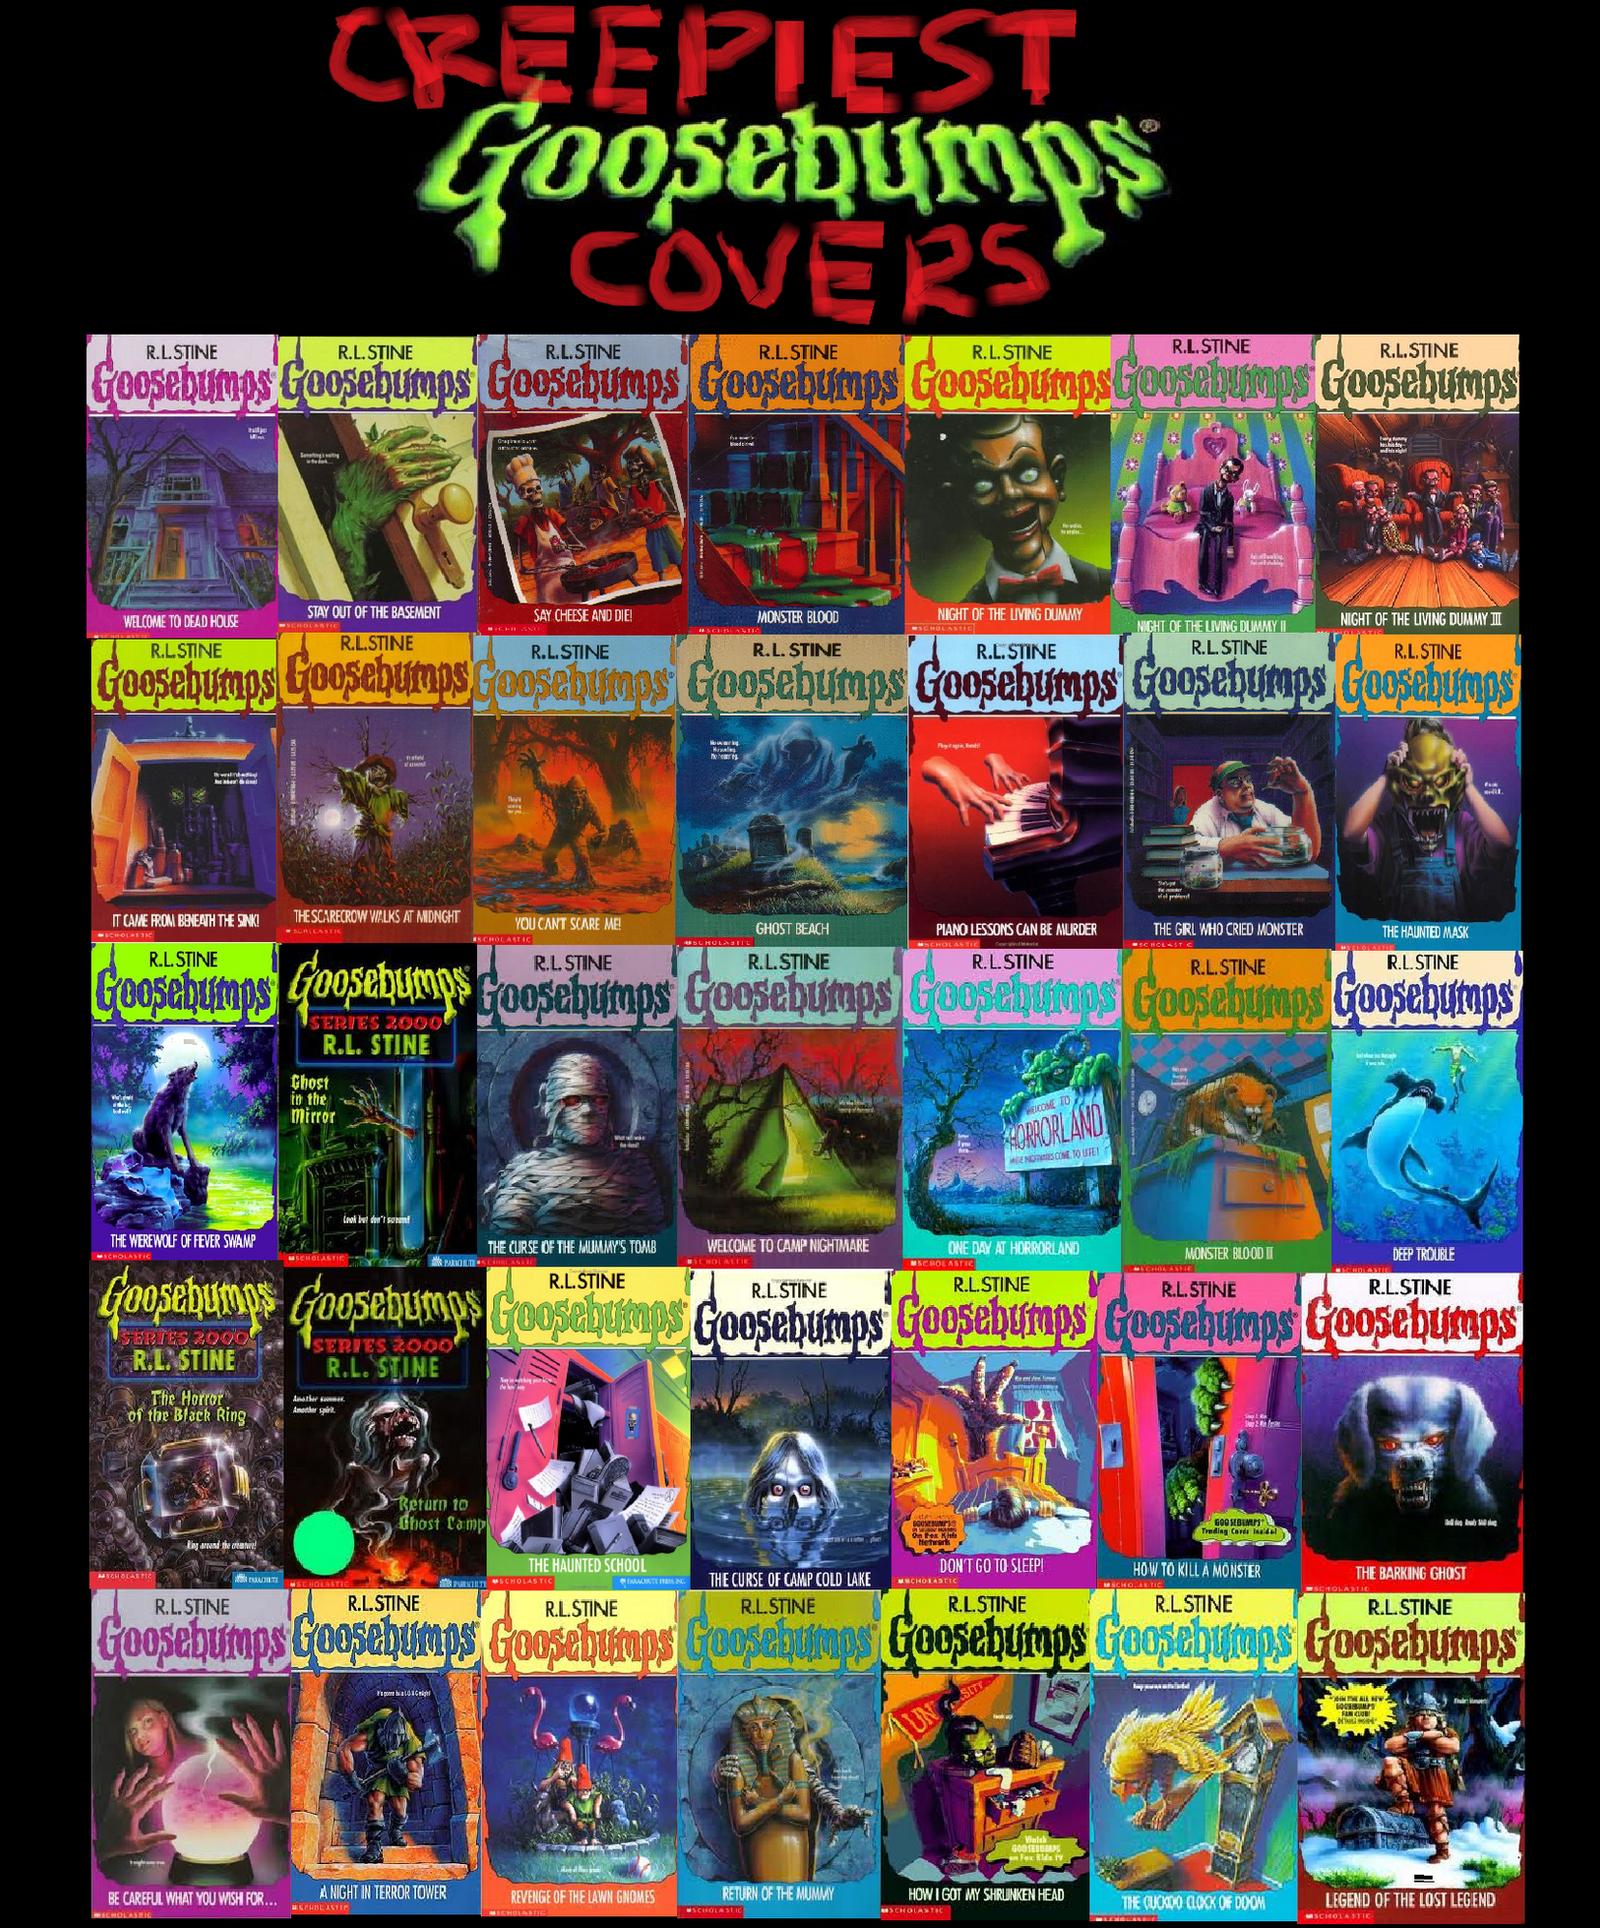 creepiest goosebumps covers by shadowstalker55 on deviantart